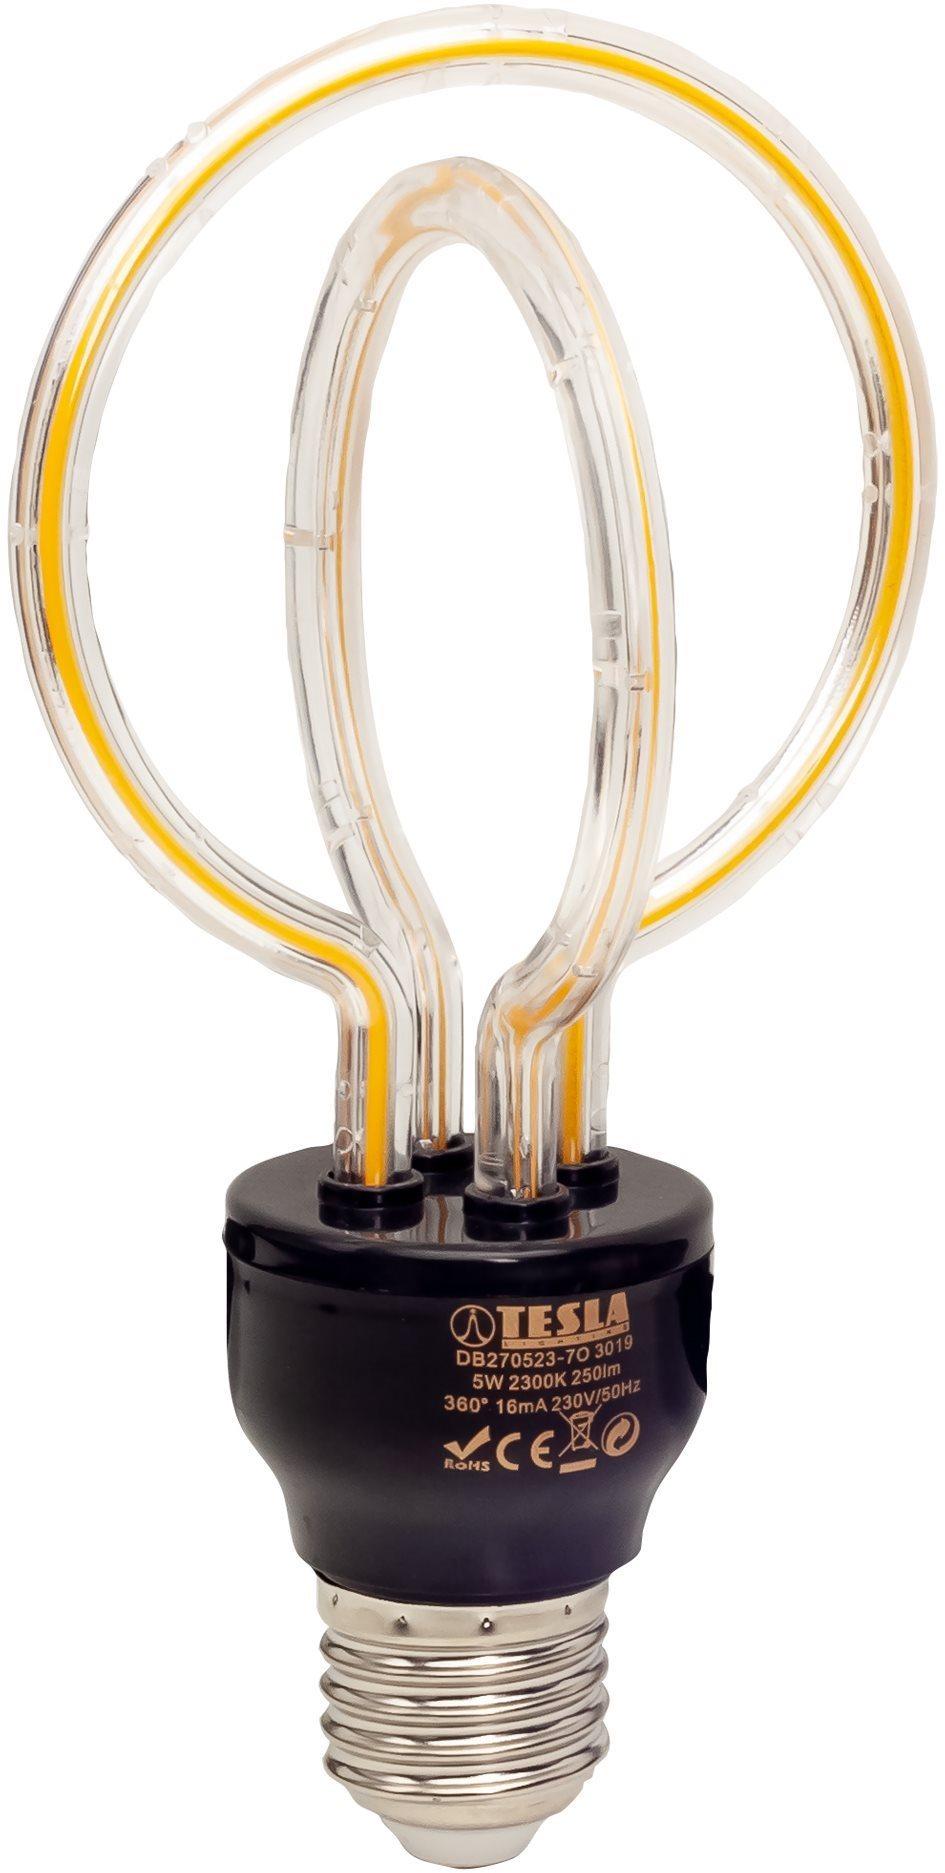 Tesla Design BULB filament E27, 5W, 230V, 250lm, 2300K, 360° lotus